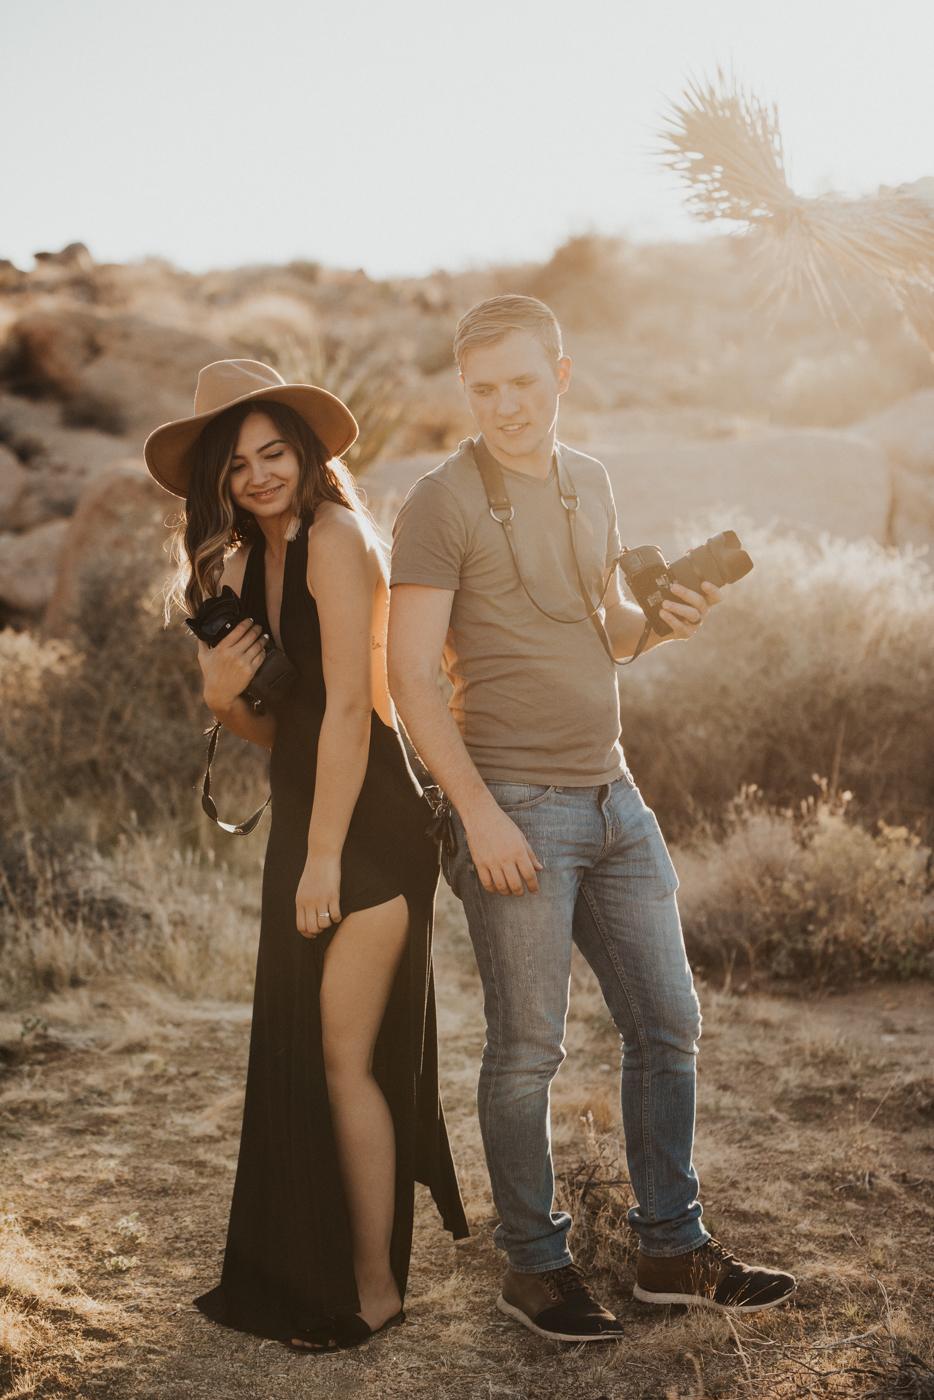 FortSt.John_photographer_TyraEPhotography_Wedding_Couple_Family_Photograhy_DawsonCreek_Elopement_Bride_Boduoir_Portraits-4273.jpg